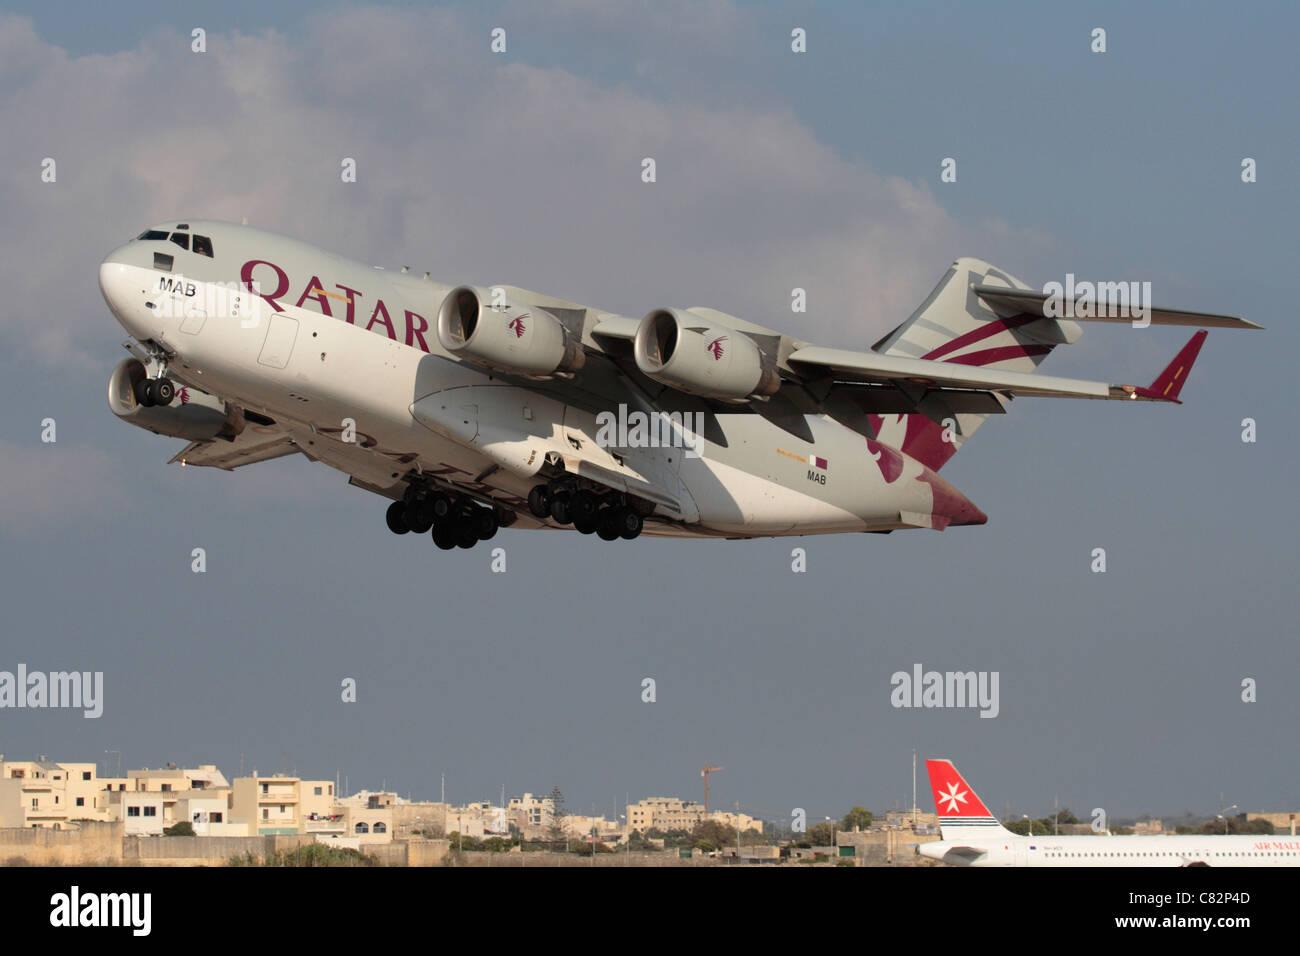 Qatar Emiri Air Force Boeing C-17A Globemaster III heavy military cargo jet taking off Stock Photo